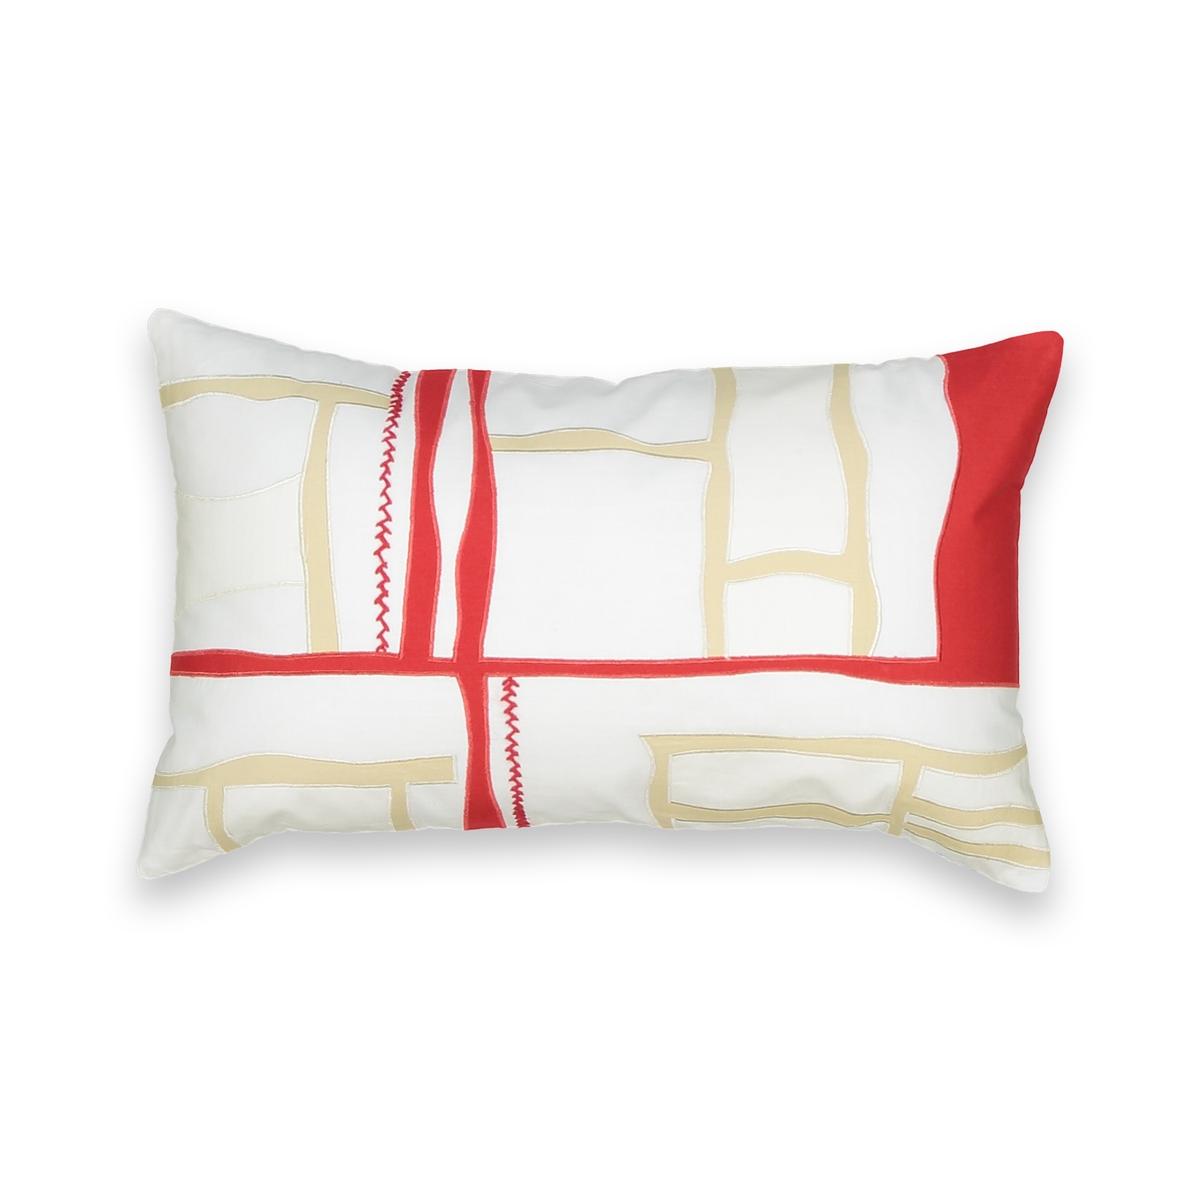 Чехол La Redoute На подушку-валик в стиле пэчворк с вышивкой 50 x 30 см белый наволочка la redoute flooch 50 x 30 см бежевый